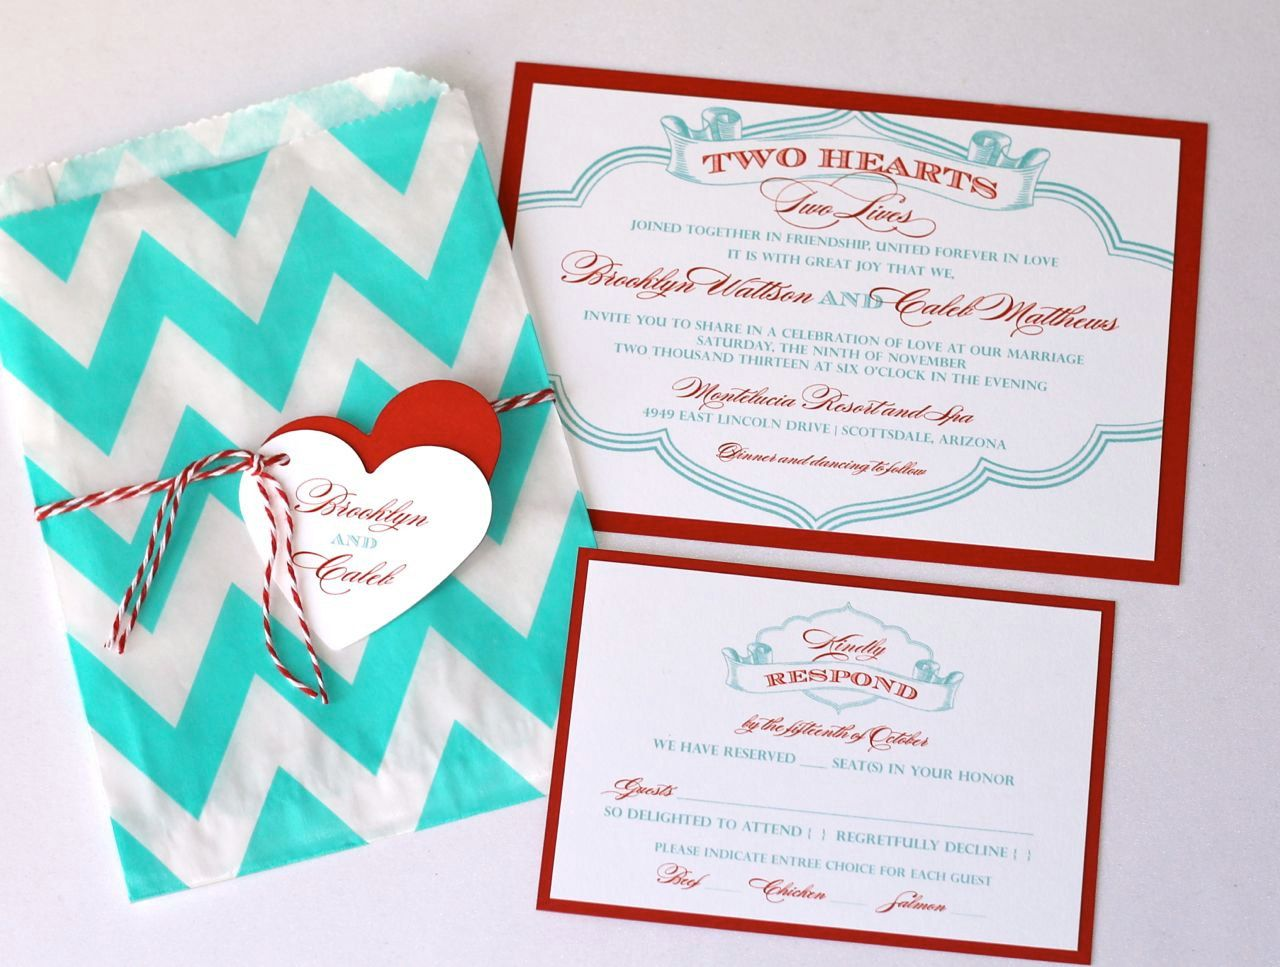 Brooklyn Wedding Invitation Sample - Chevron Design - Red, Turquoise ...